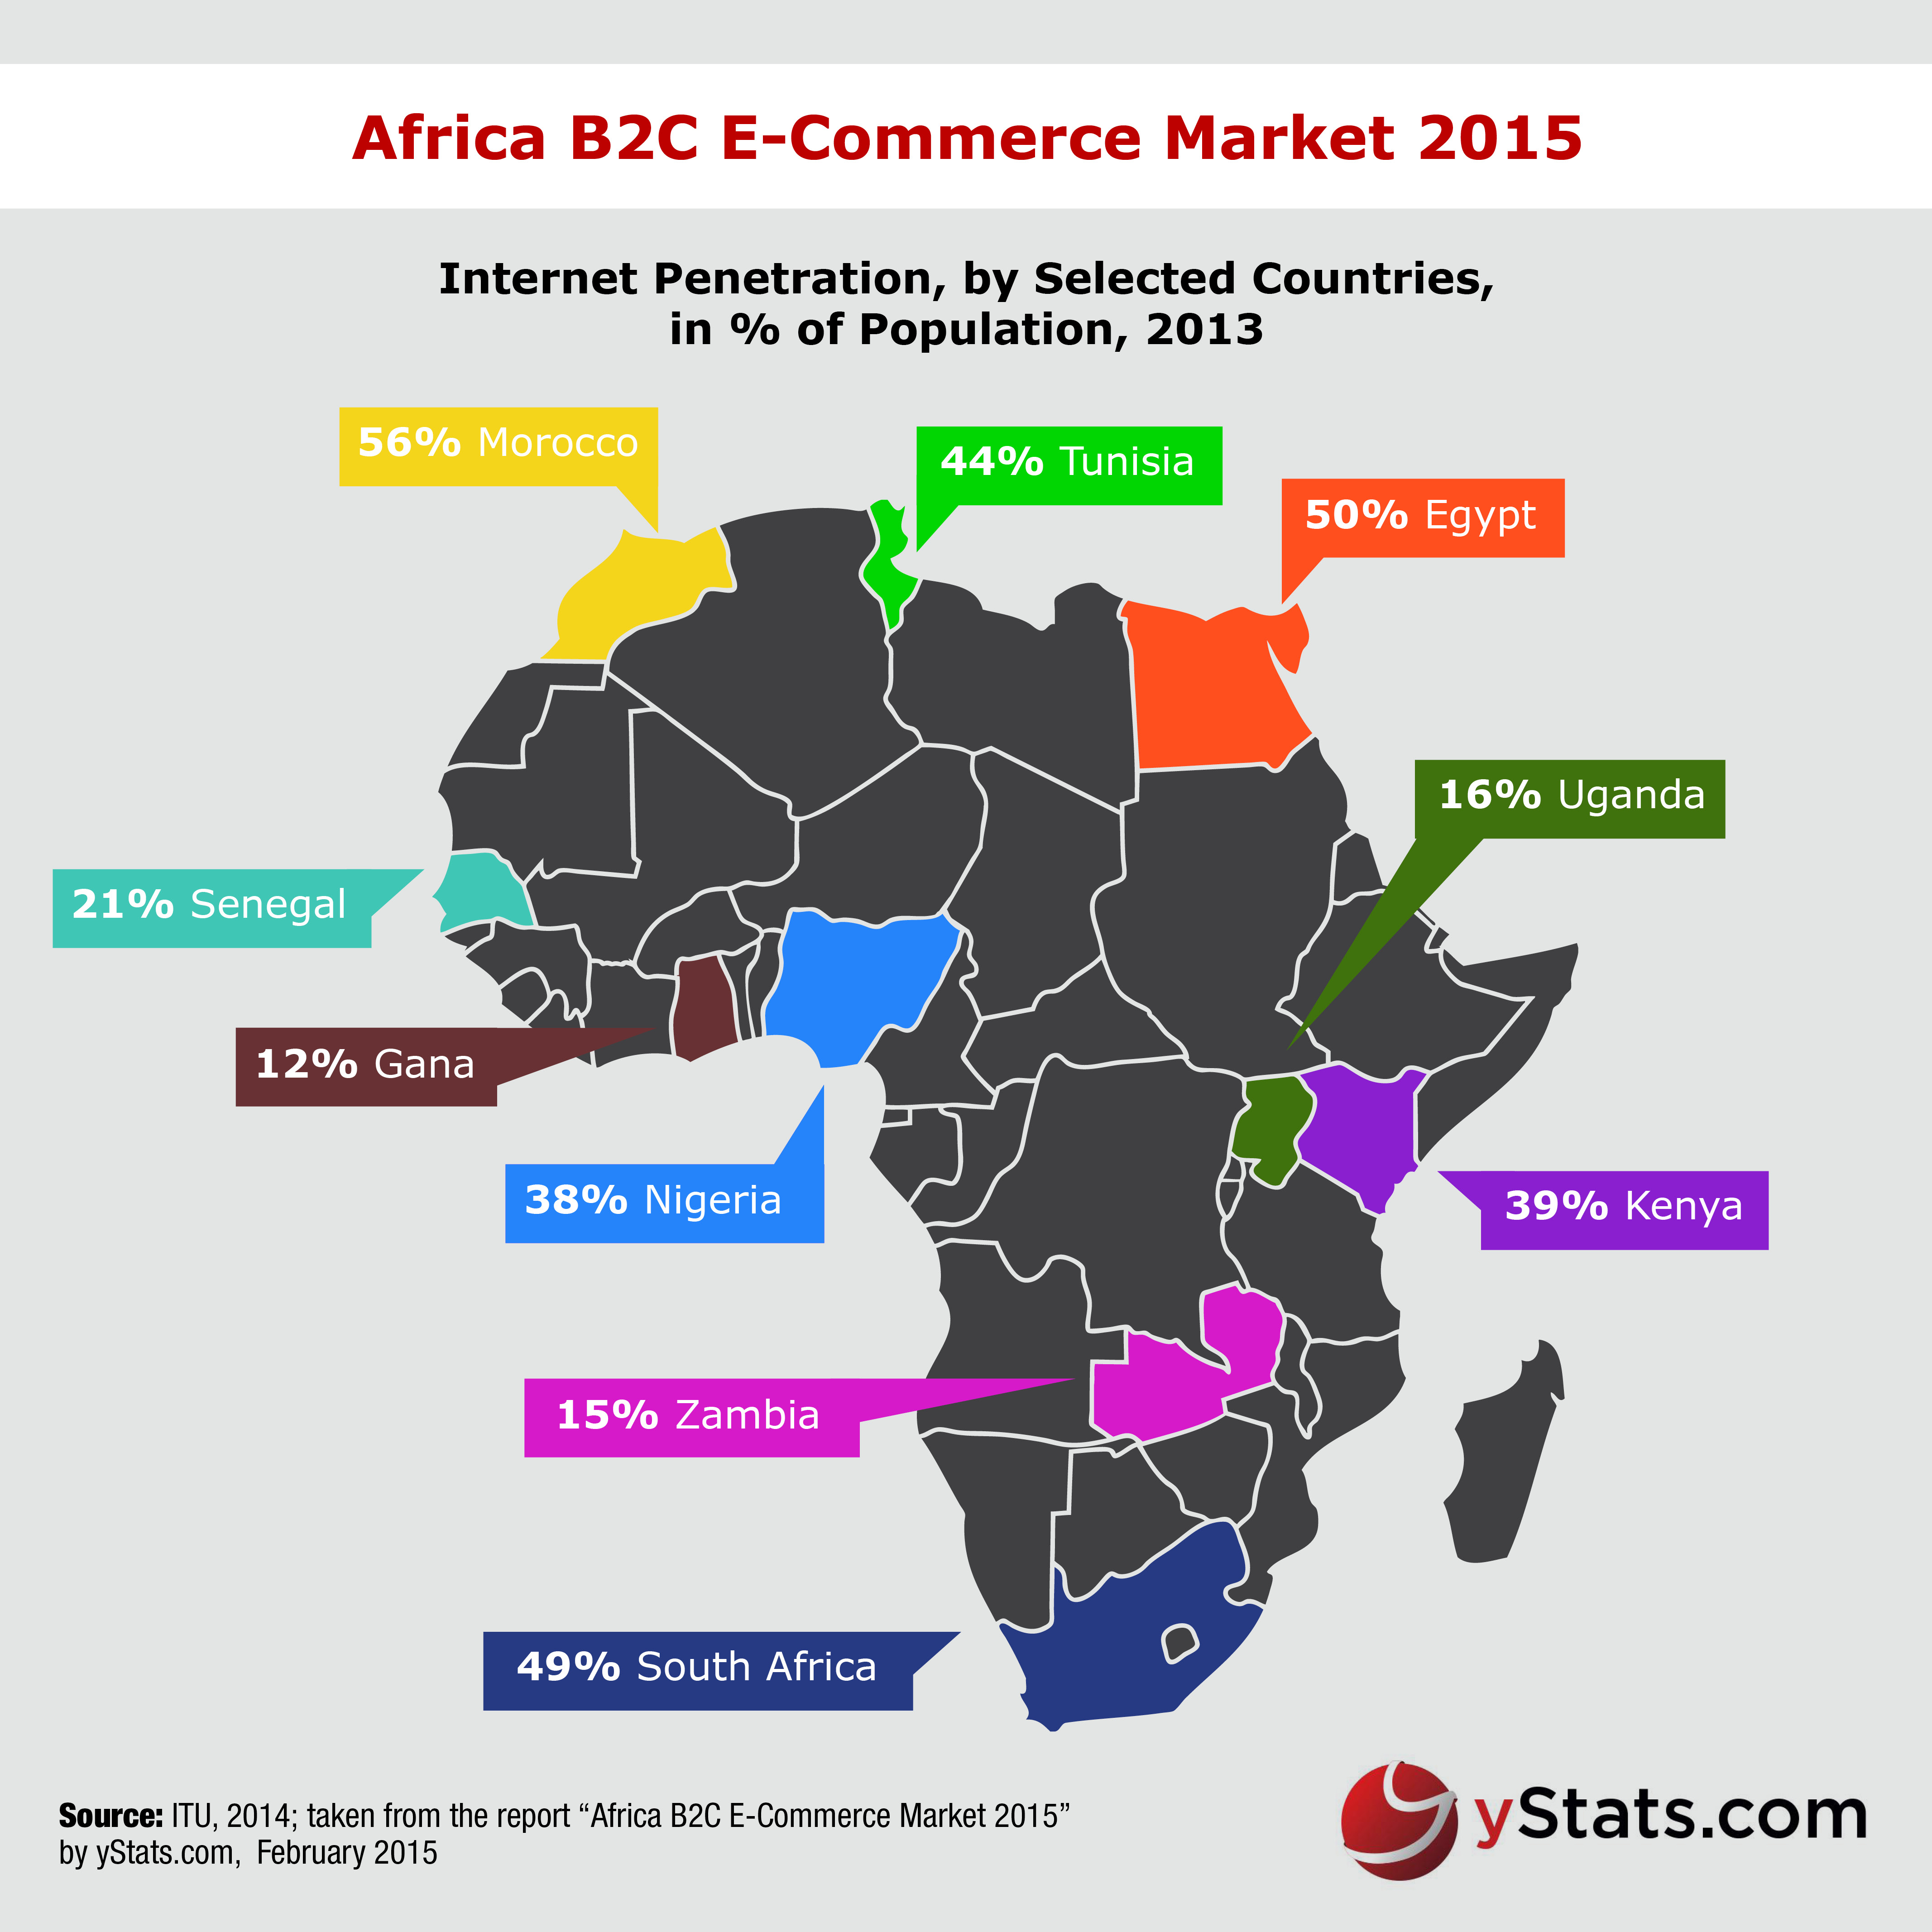 E Commerce Site Map: YStats.com Infographic Africa B2C E-Commerce Market 2015